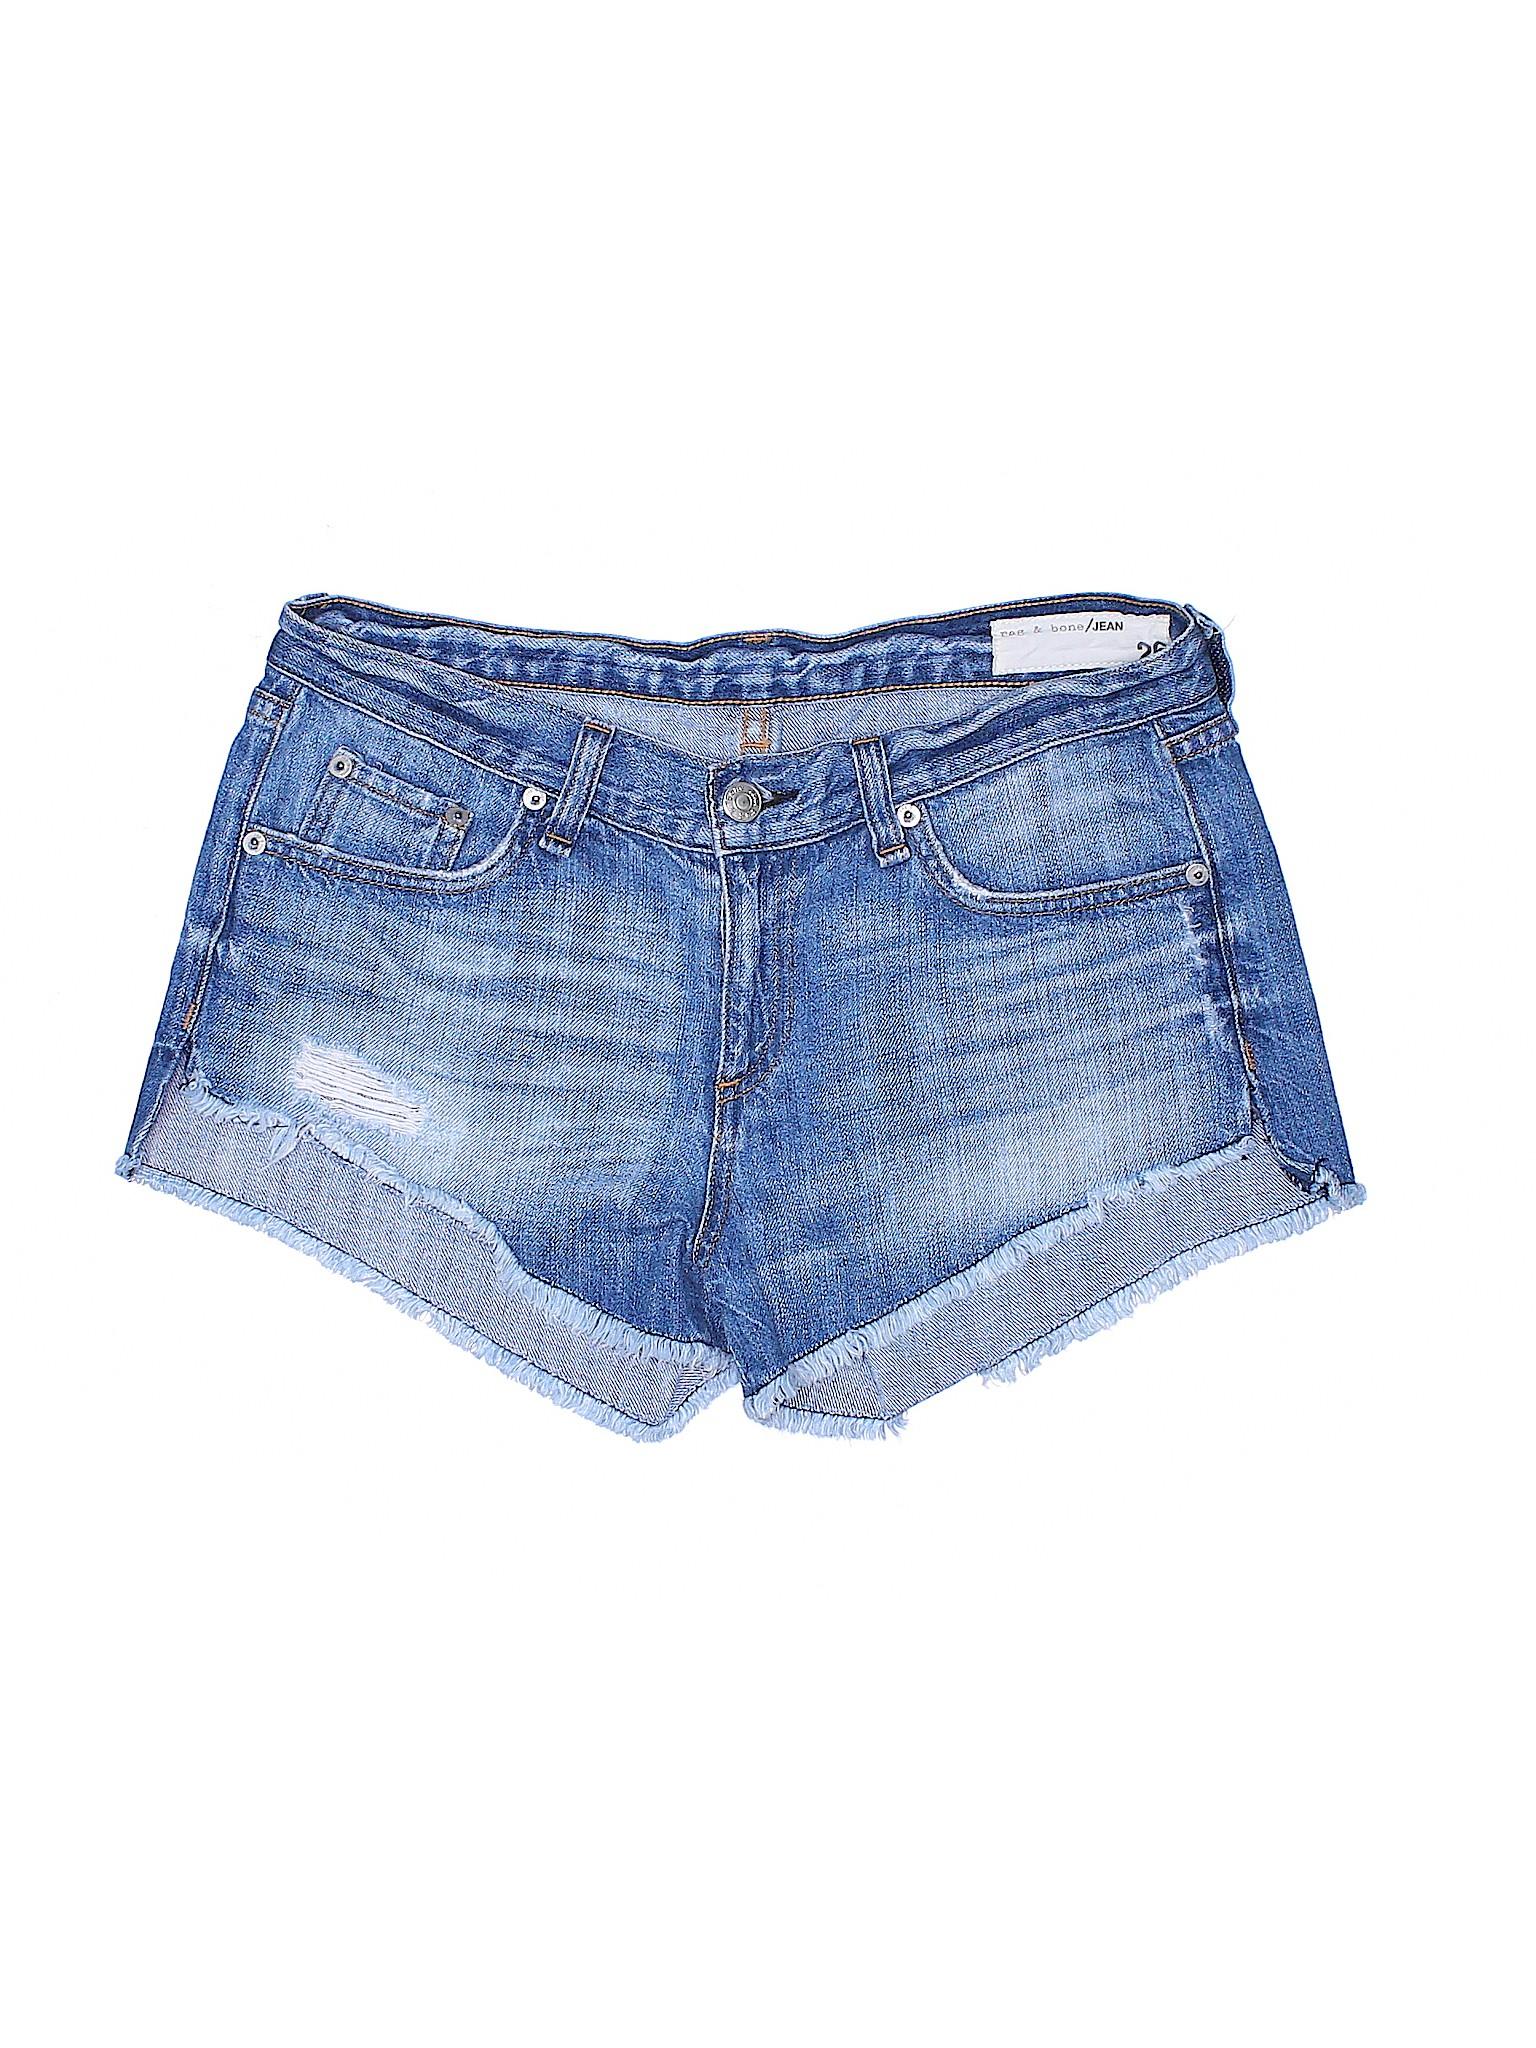 Bone Shorts Boutique Denim amp; Rag q0wO7EZ